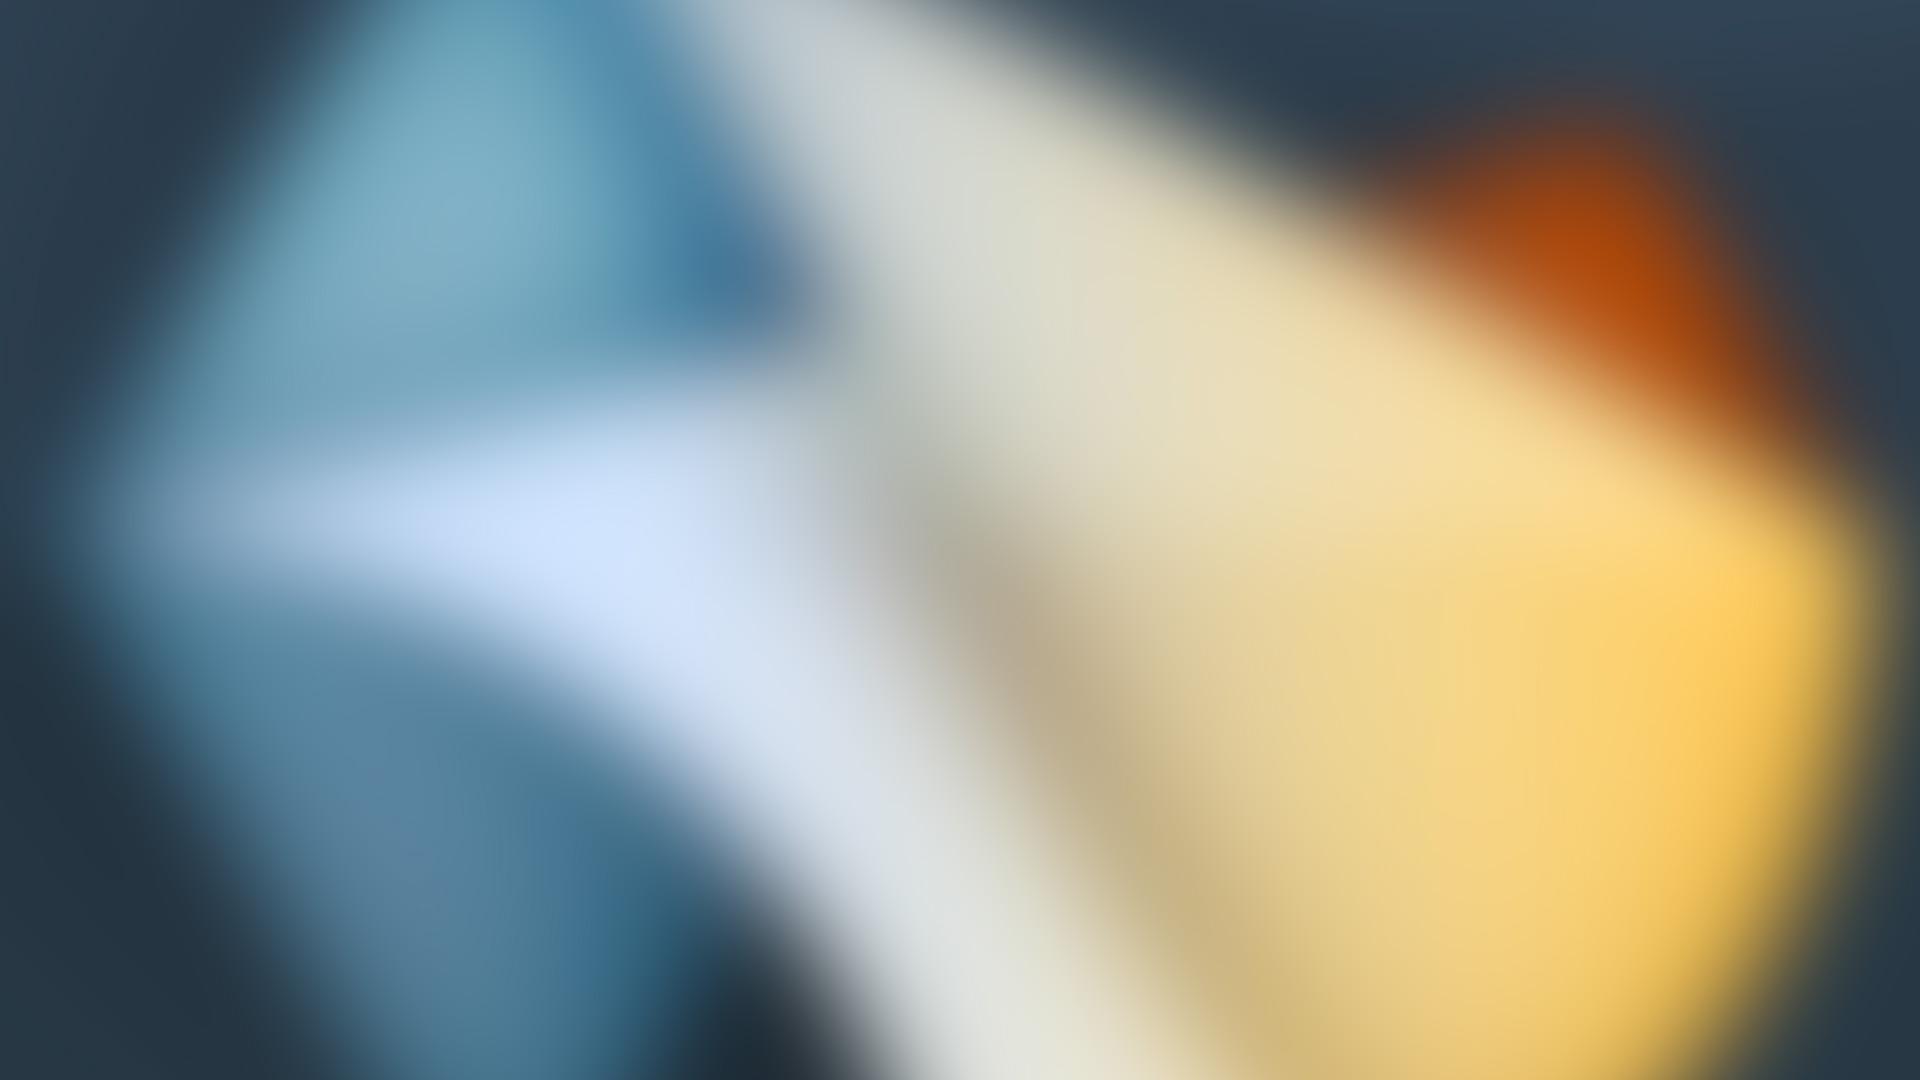 Mobilee219_LisSarroca_BlueDesert_bg-blur